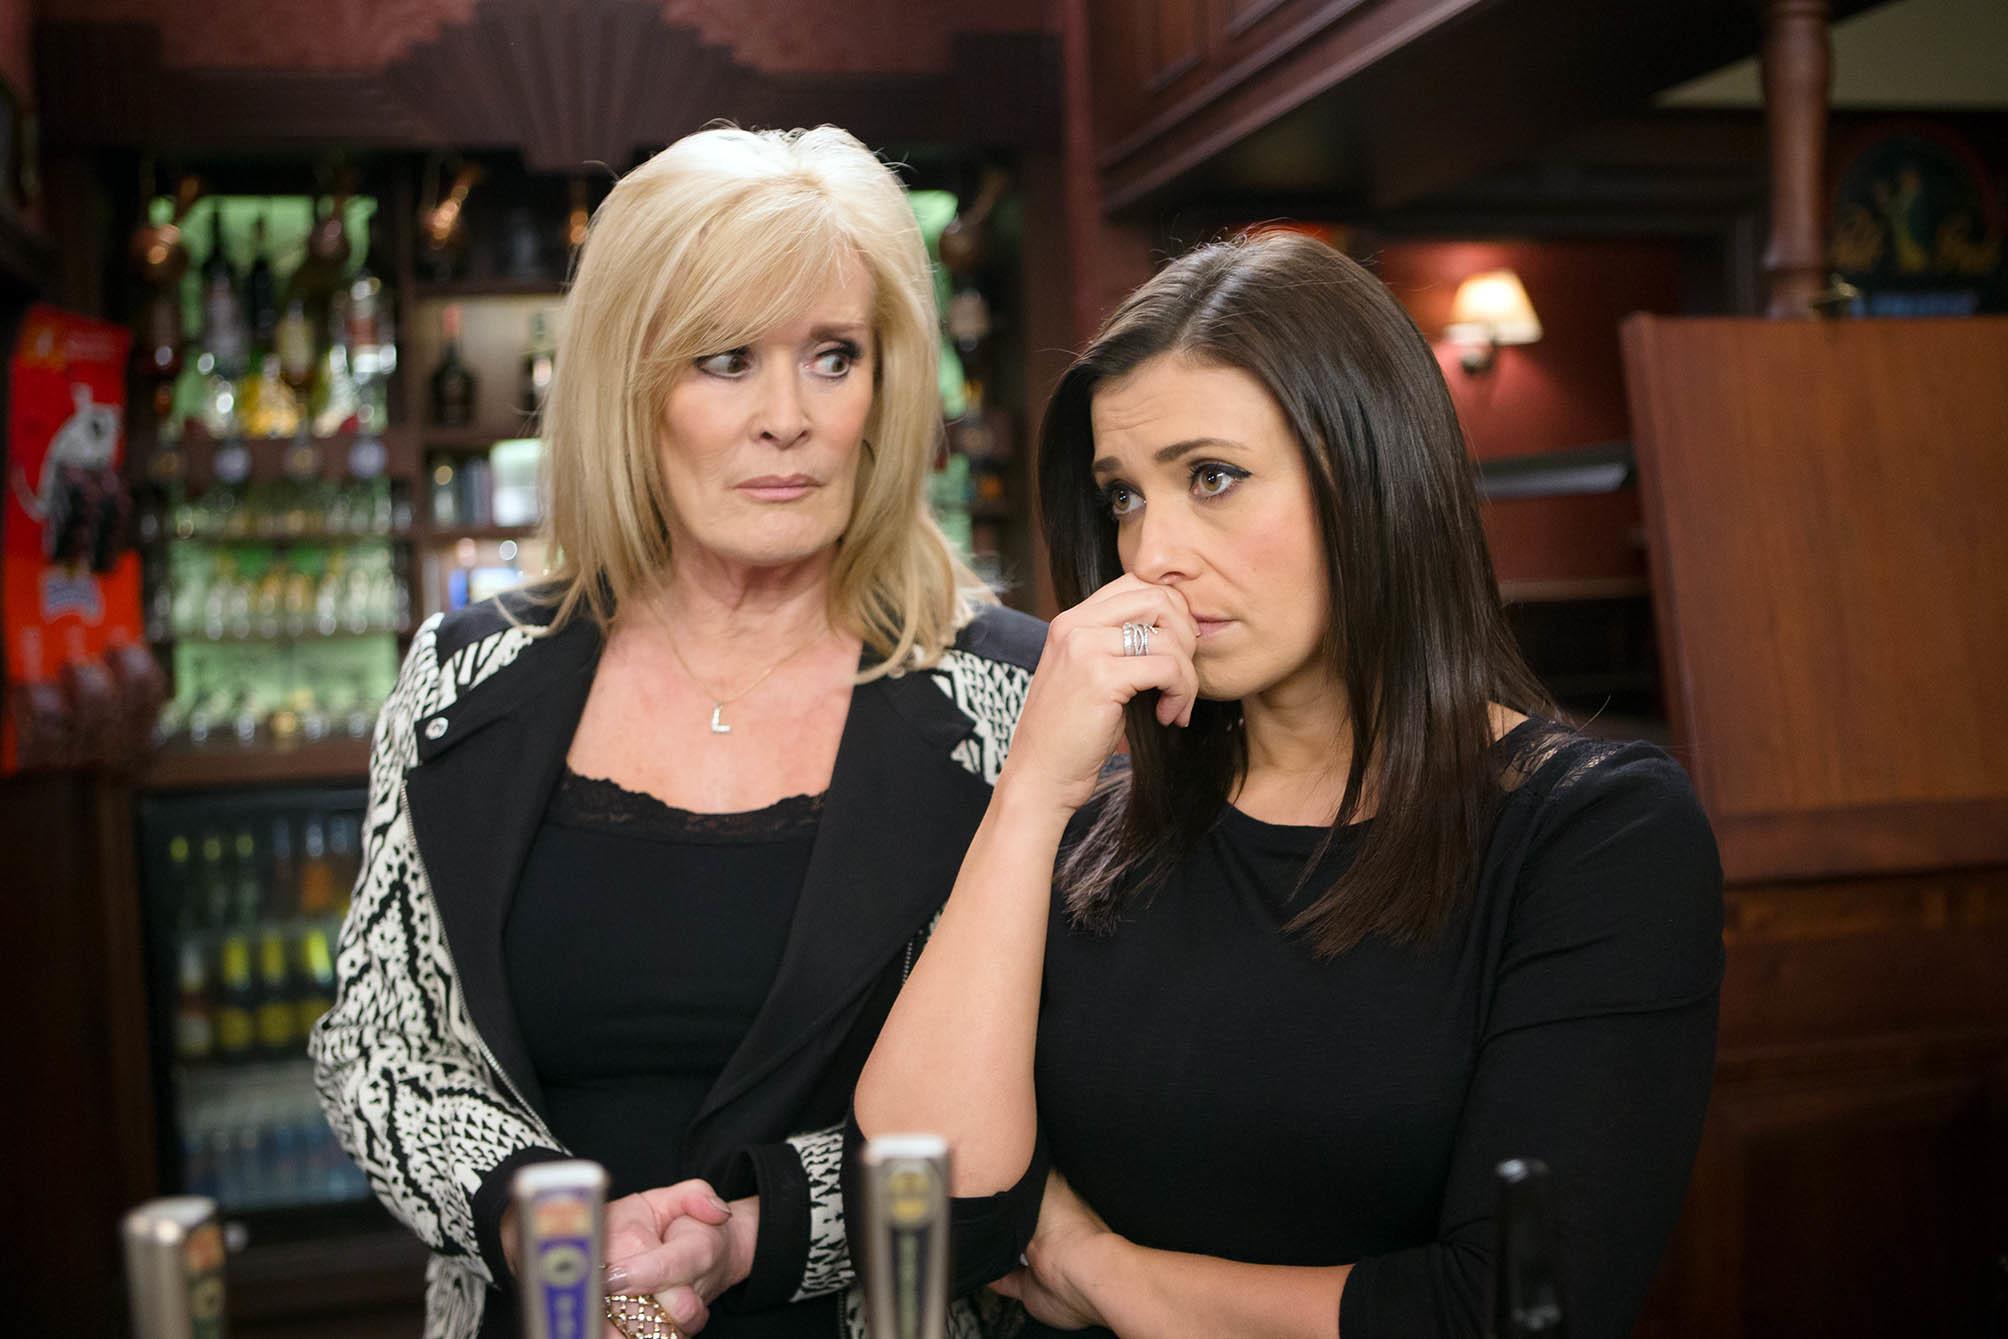 Coronation Street characters Liz McDonald (Beverley Callard) and Michelle Connor (Kym Marsh) (ITV/Mark Bruce)